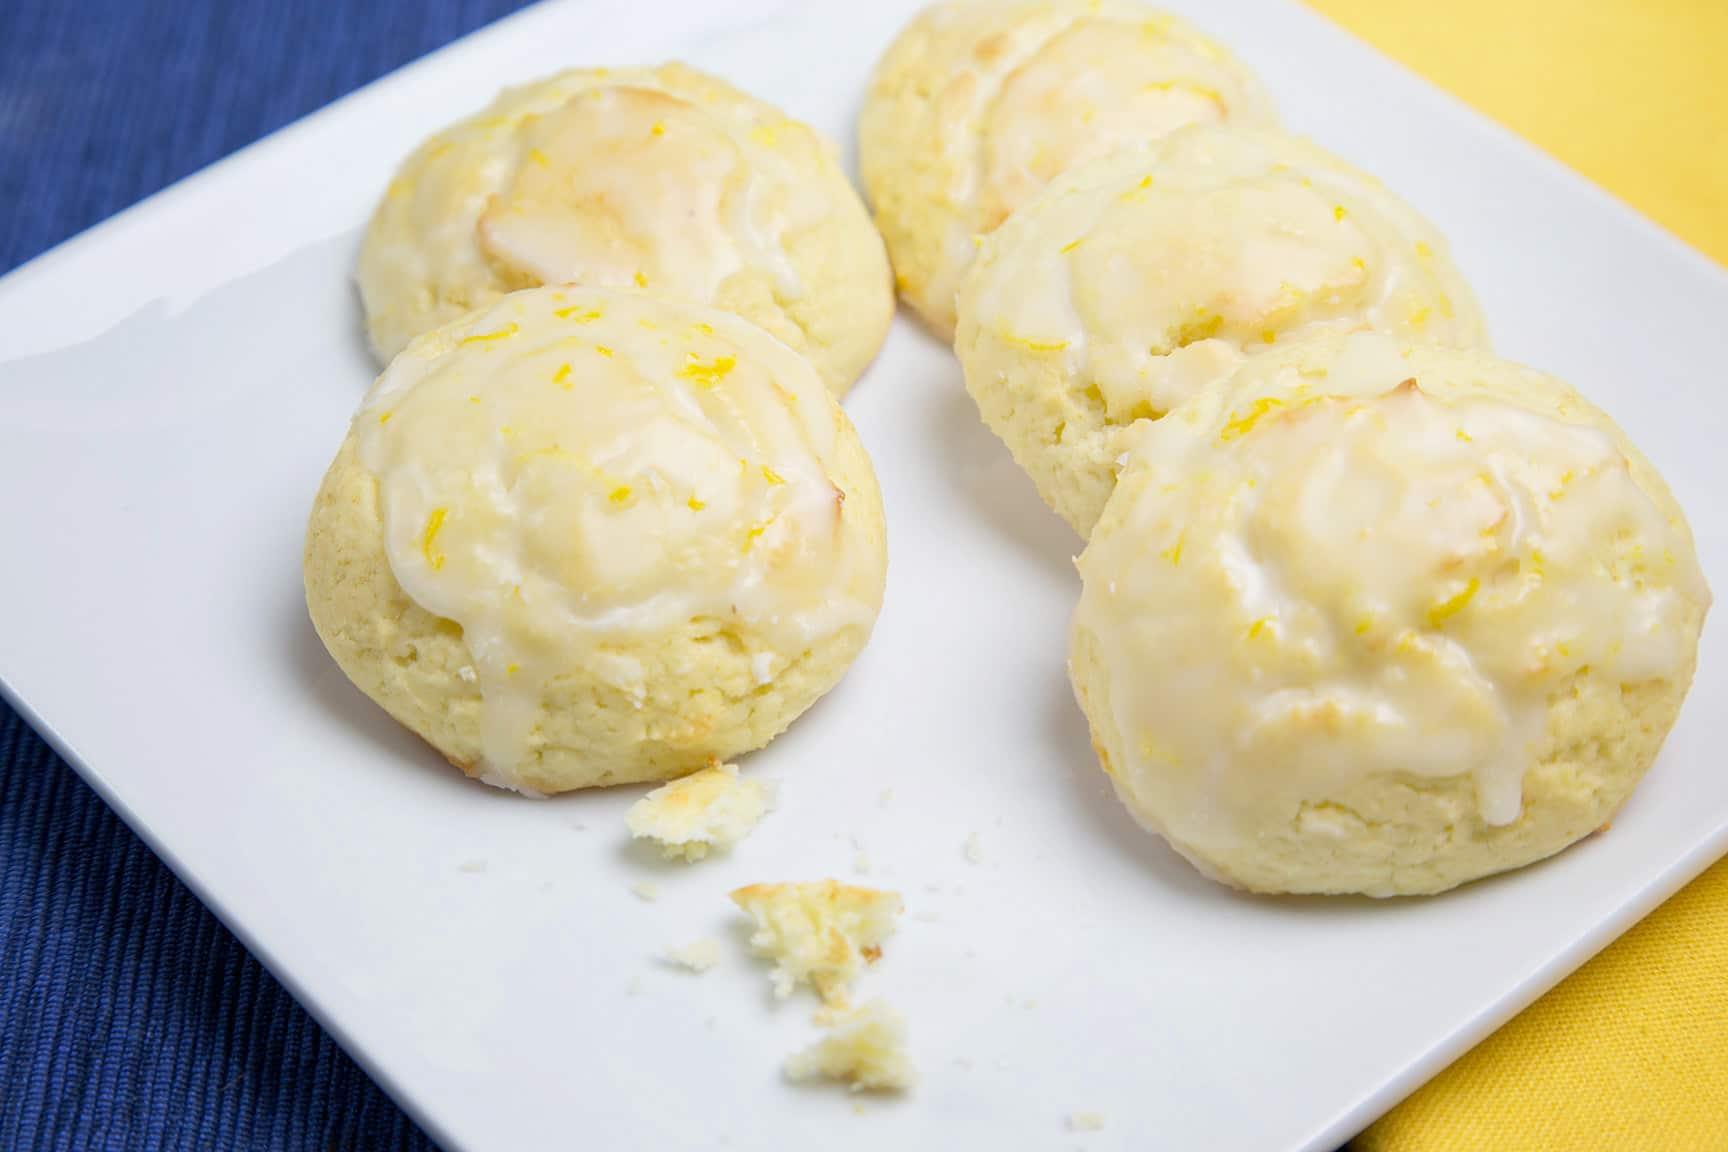 lemon ricotta cookie with lemon glaze